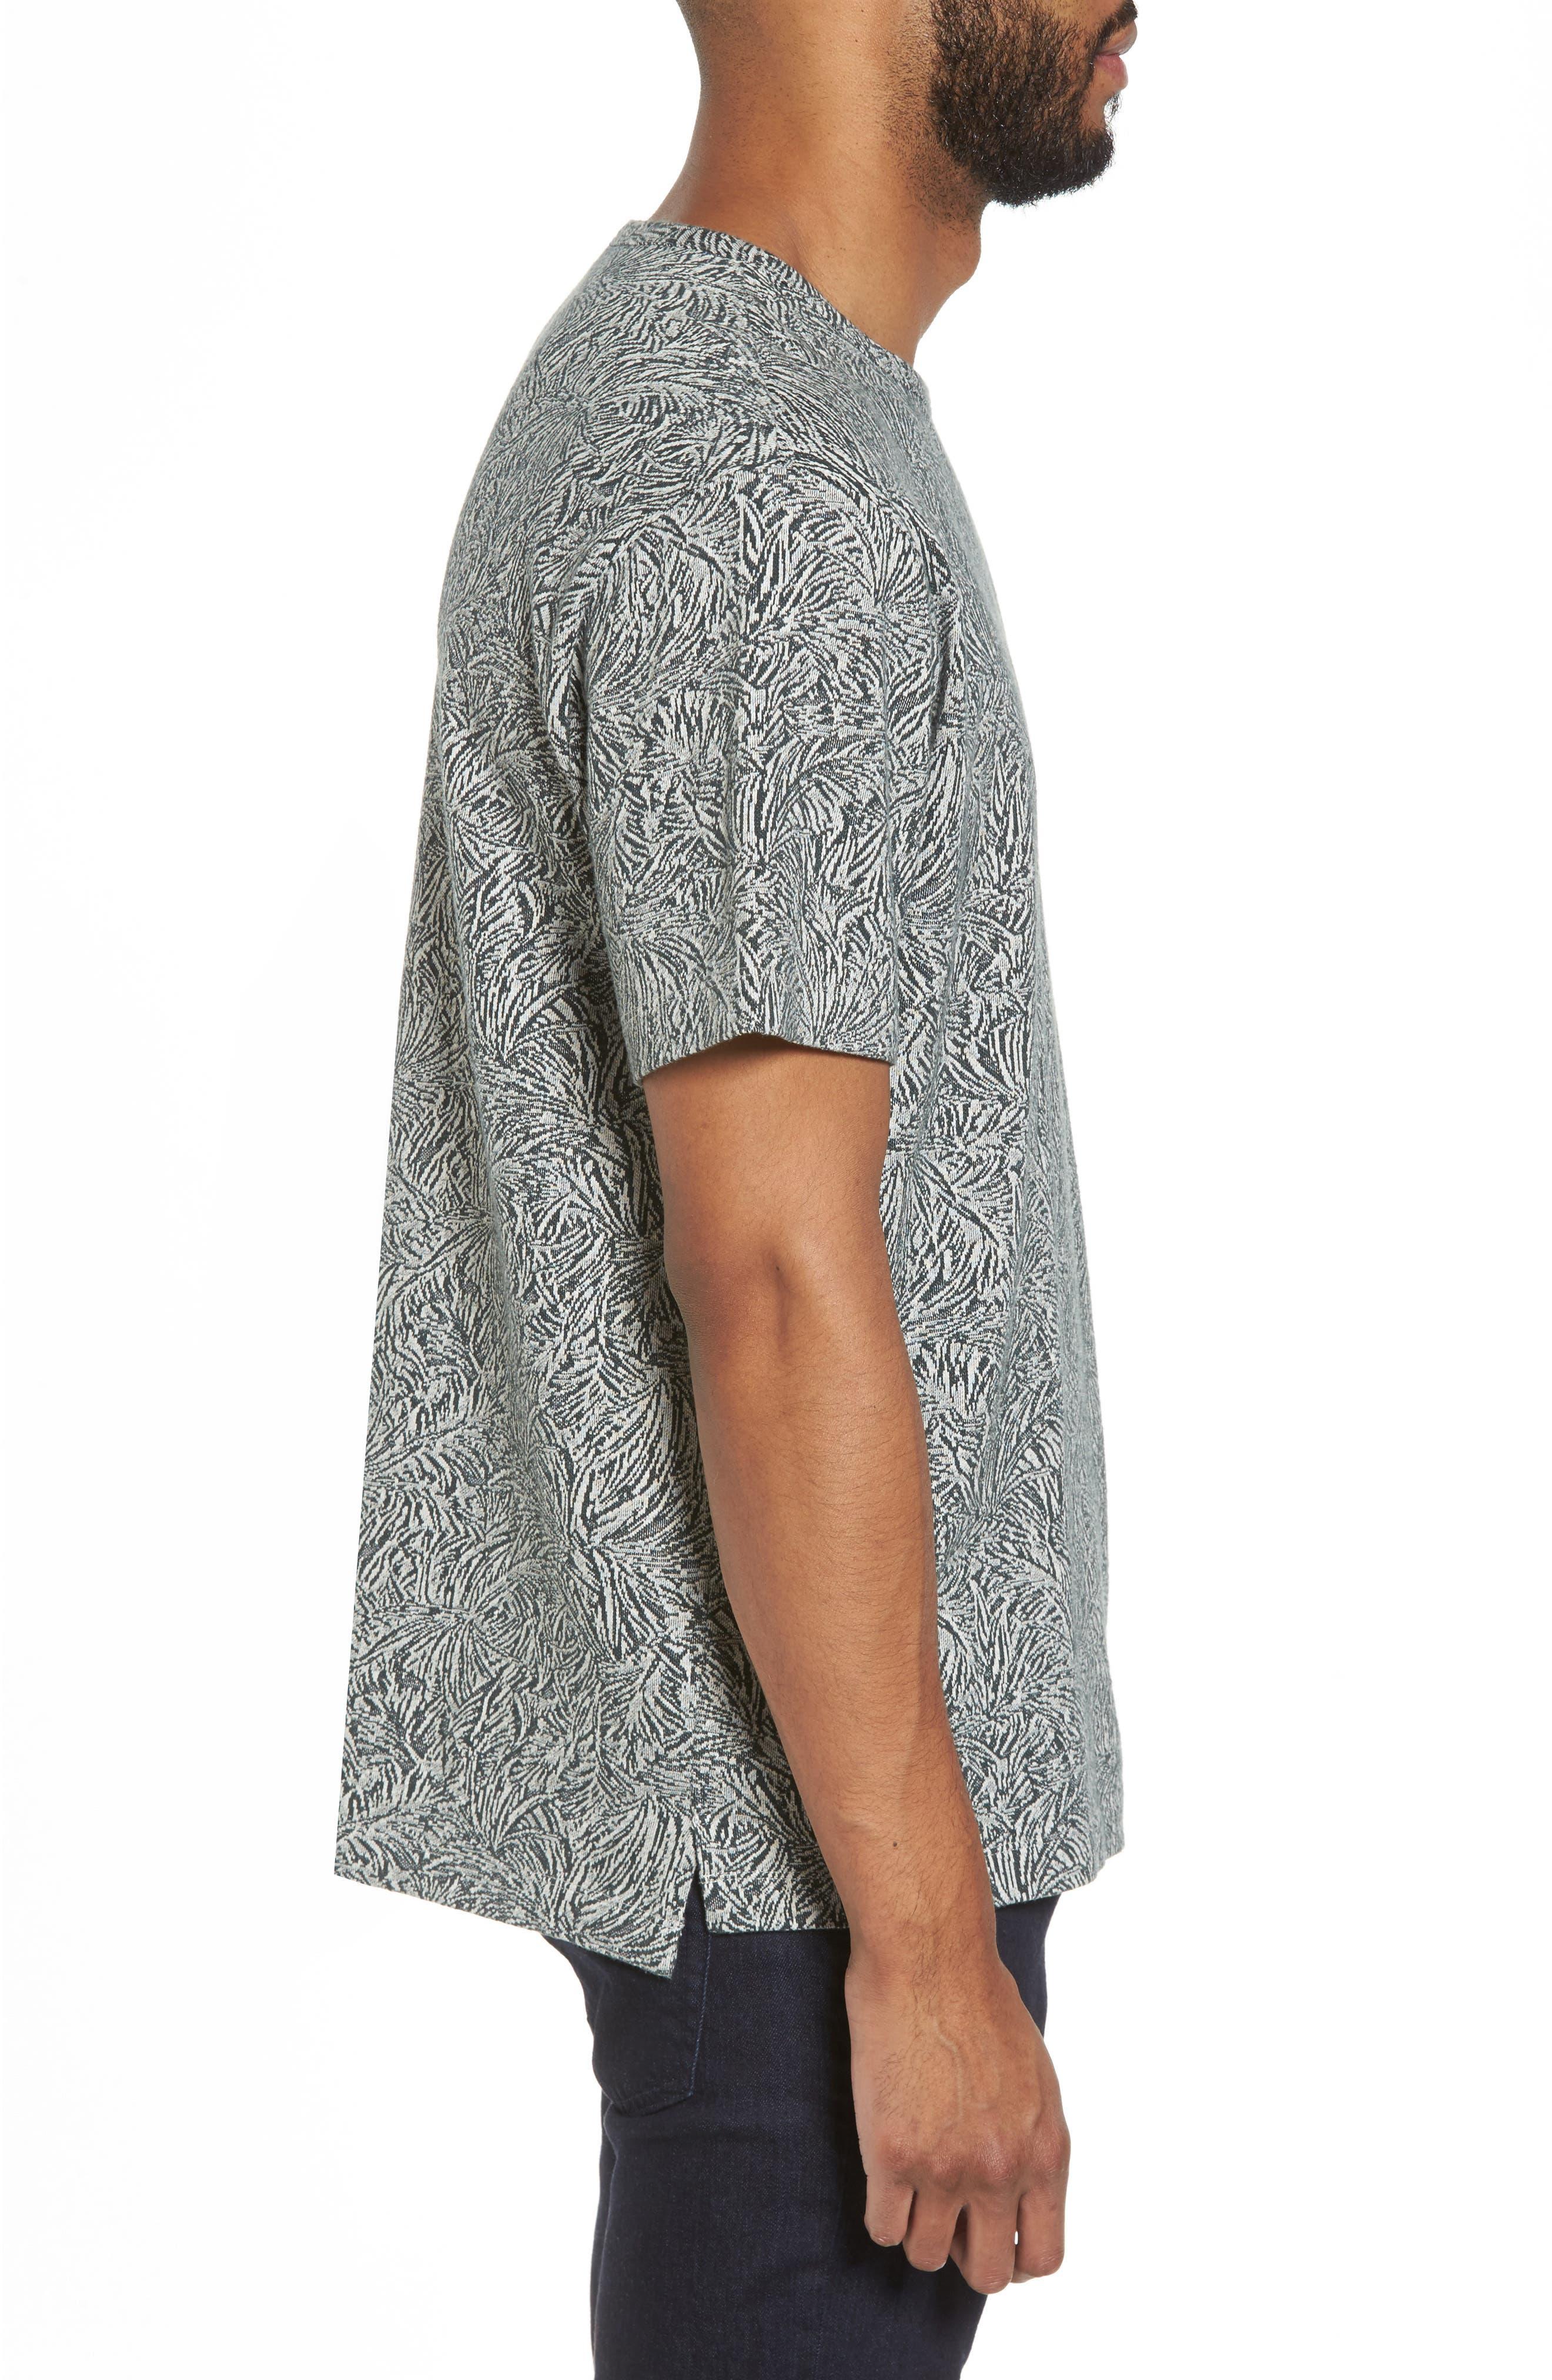 Palm Jacquard Crewneck T-Shirt,                             Alternate thumbnail 3, color,                             177